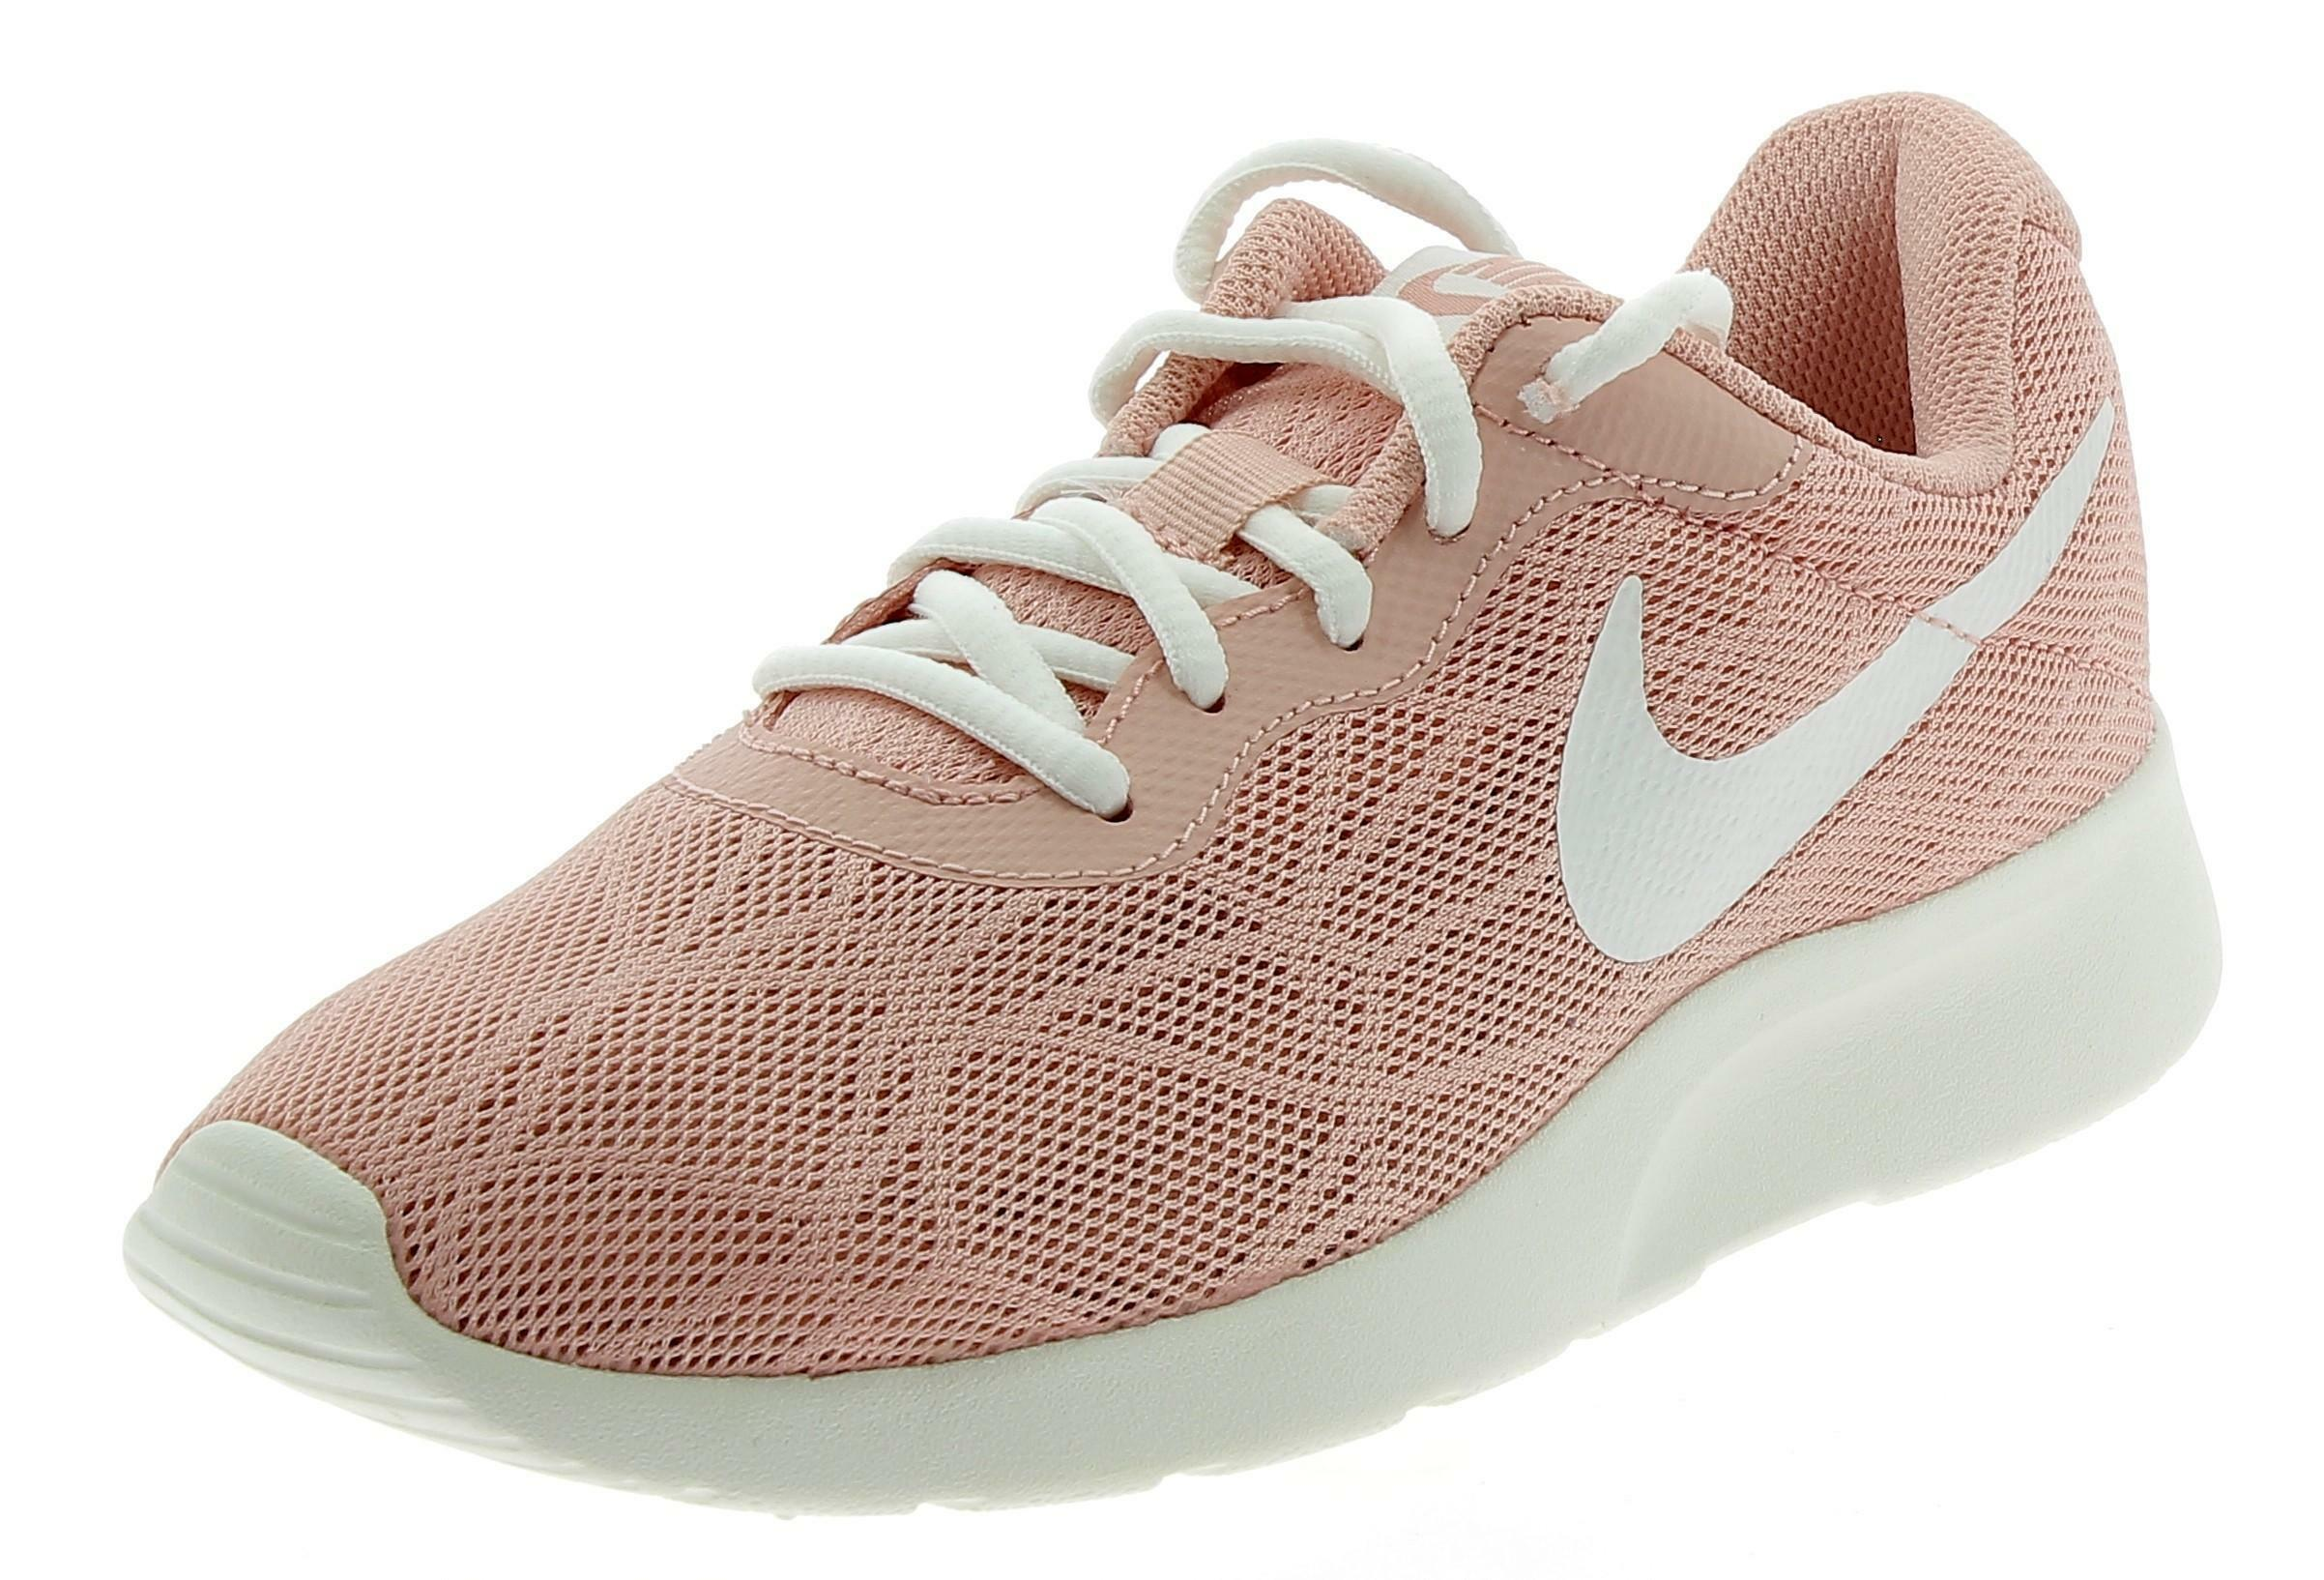 Tanjun Donna Nike 844908603 Sportive Scarpe Rosa wX8Pn0Ok